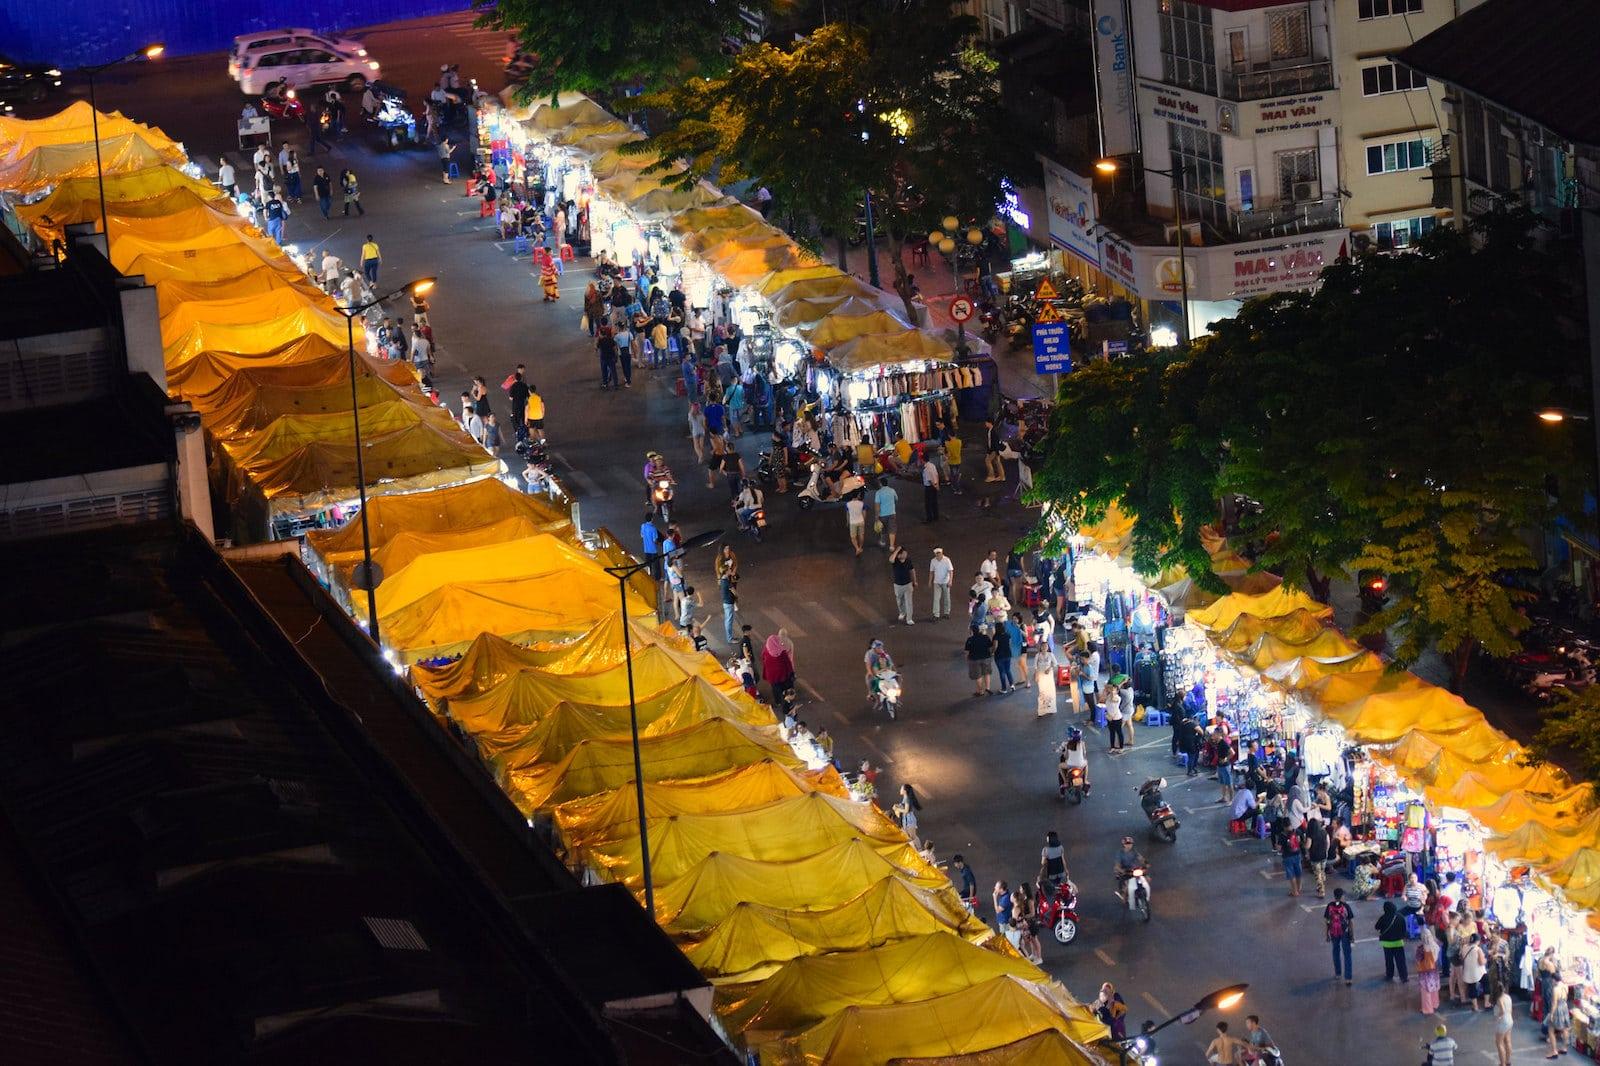 Image of the Saigon Night Market in Vietnam